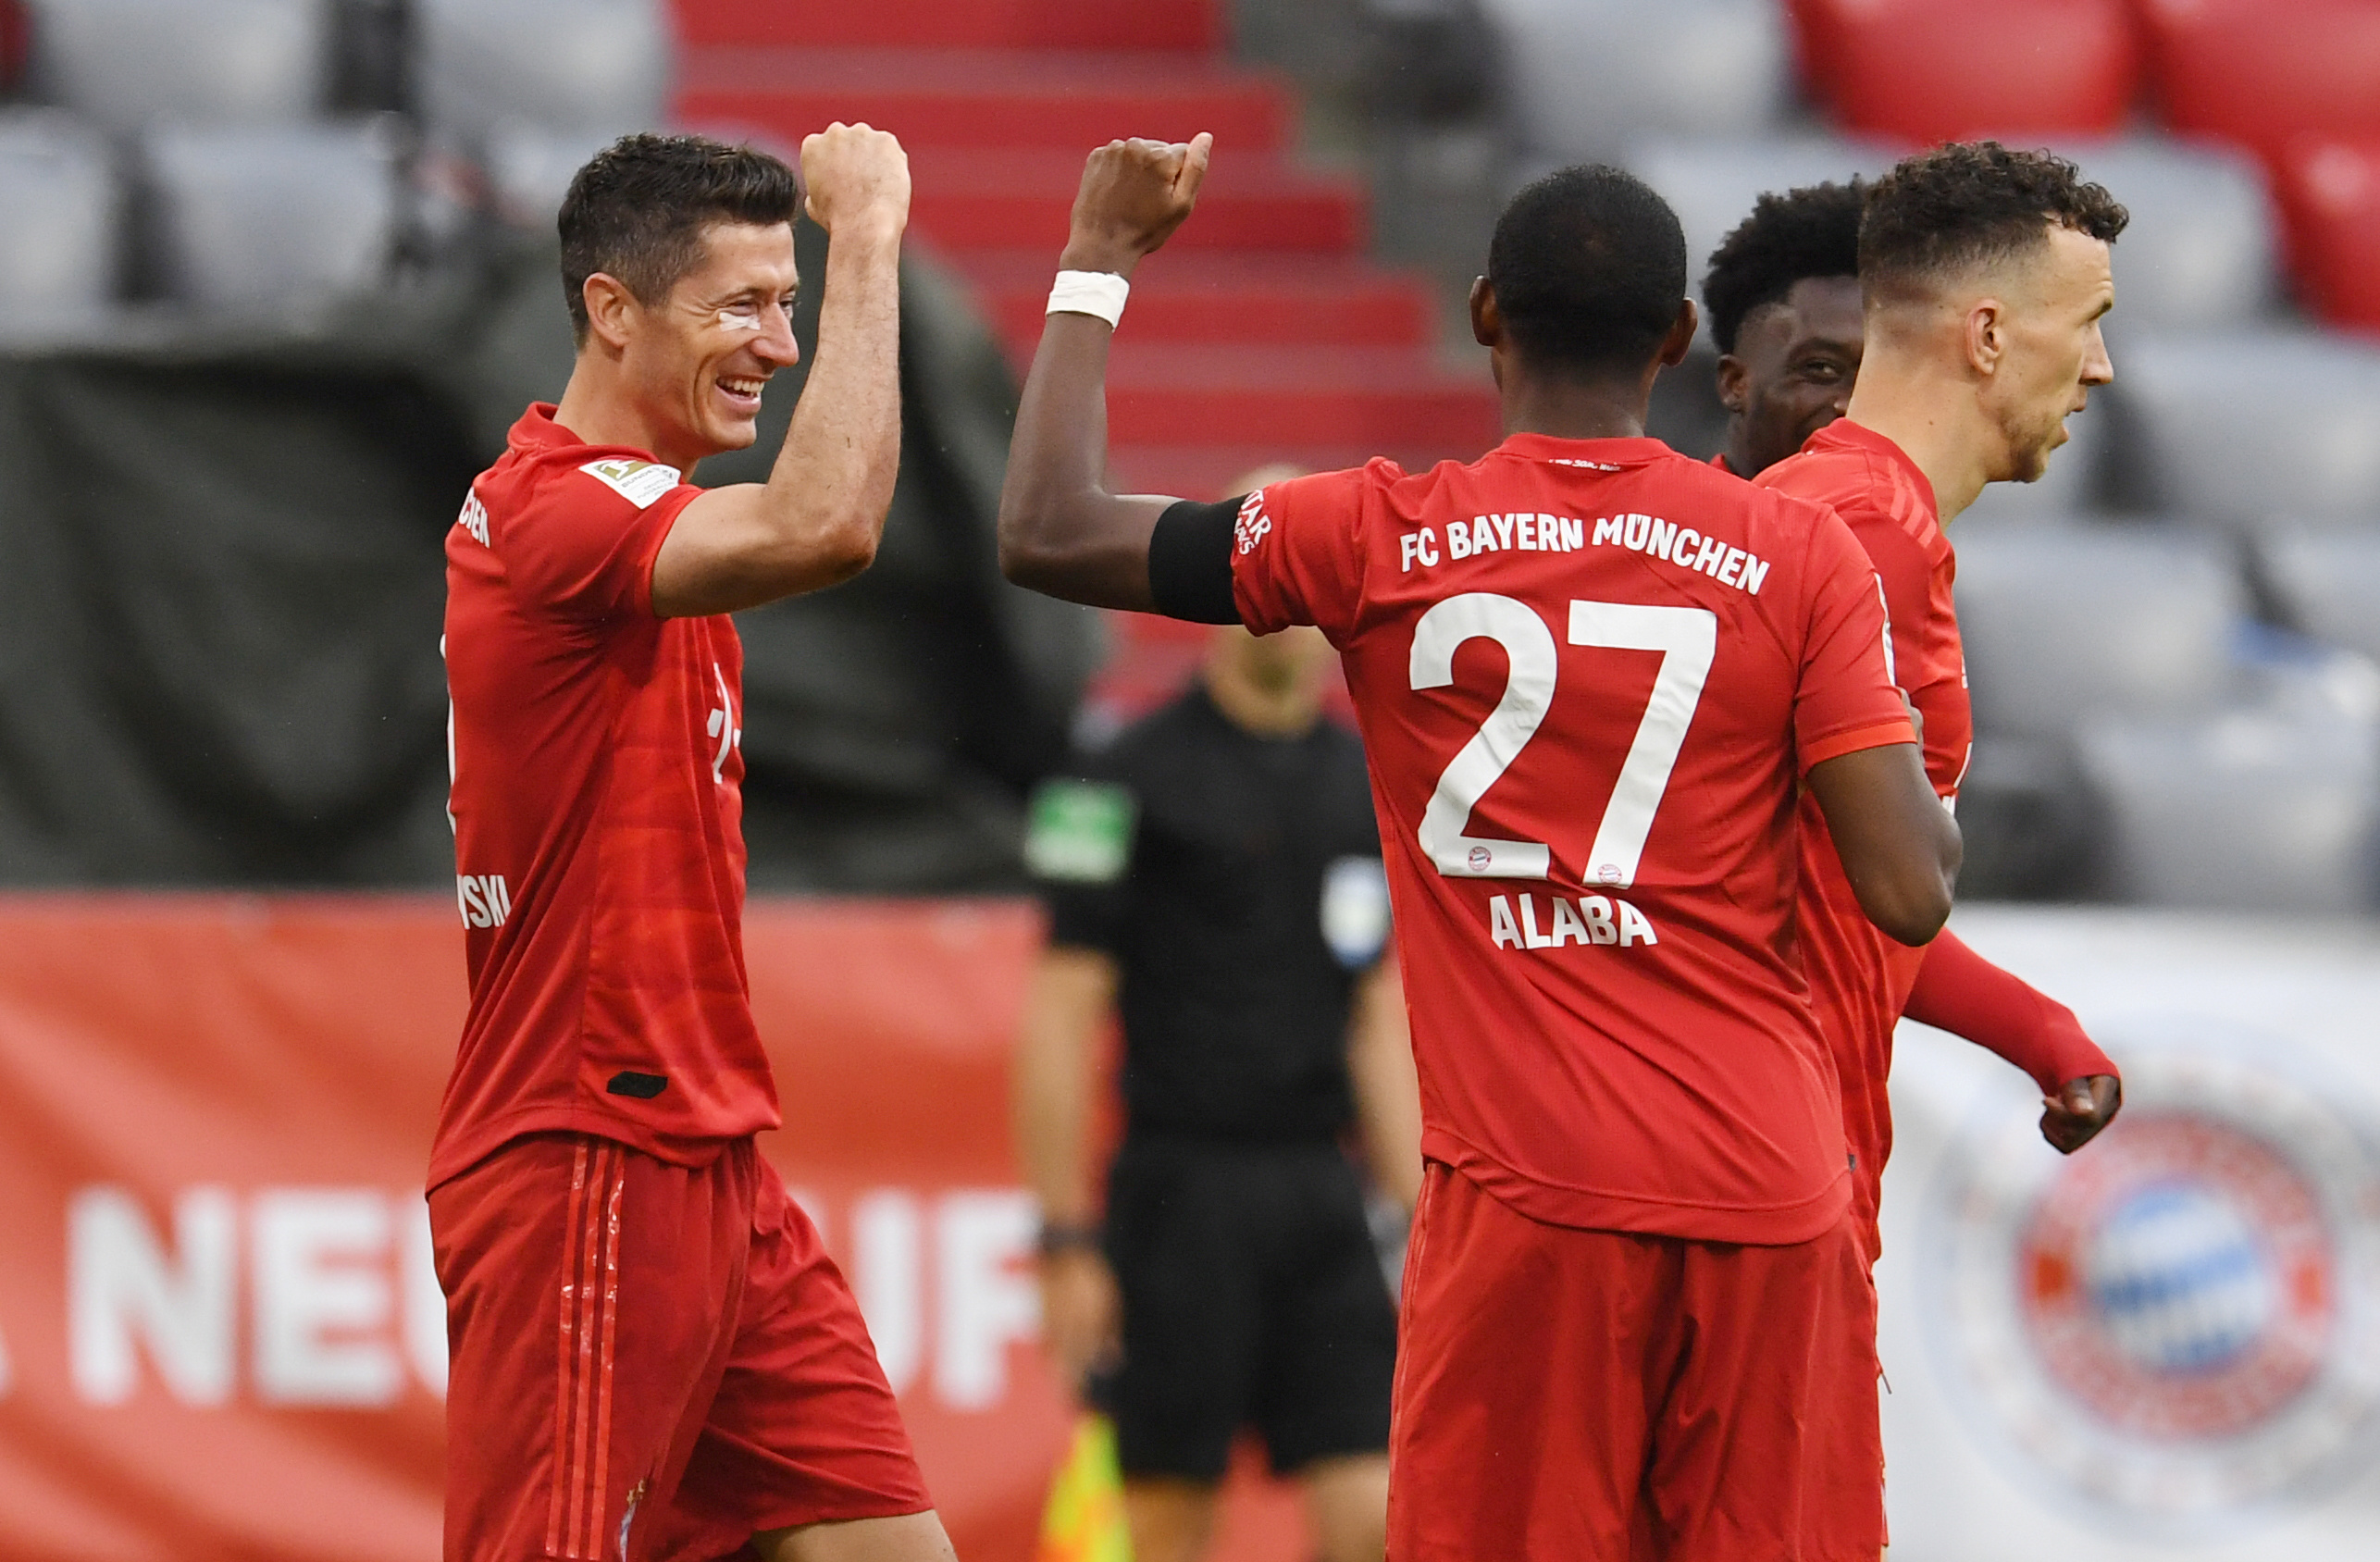 Bayern Munique goleia Eintracht Frankfurt e isola-se na liderança